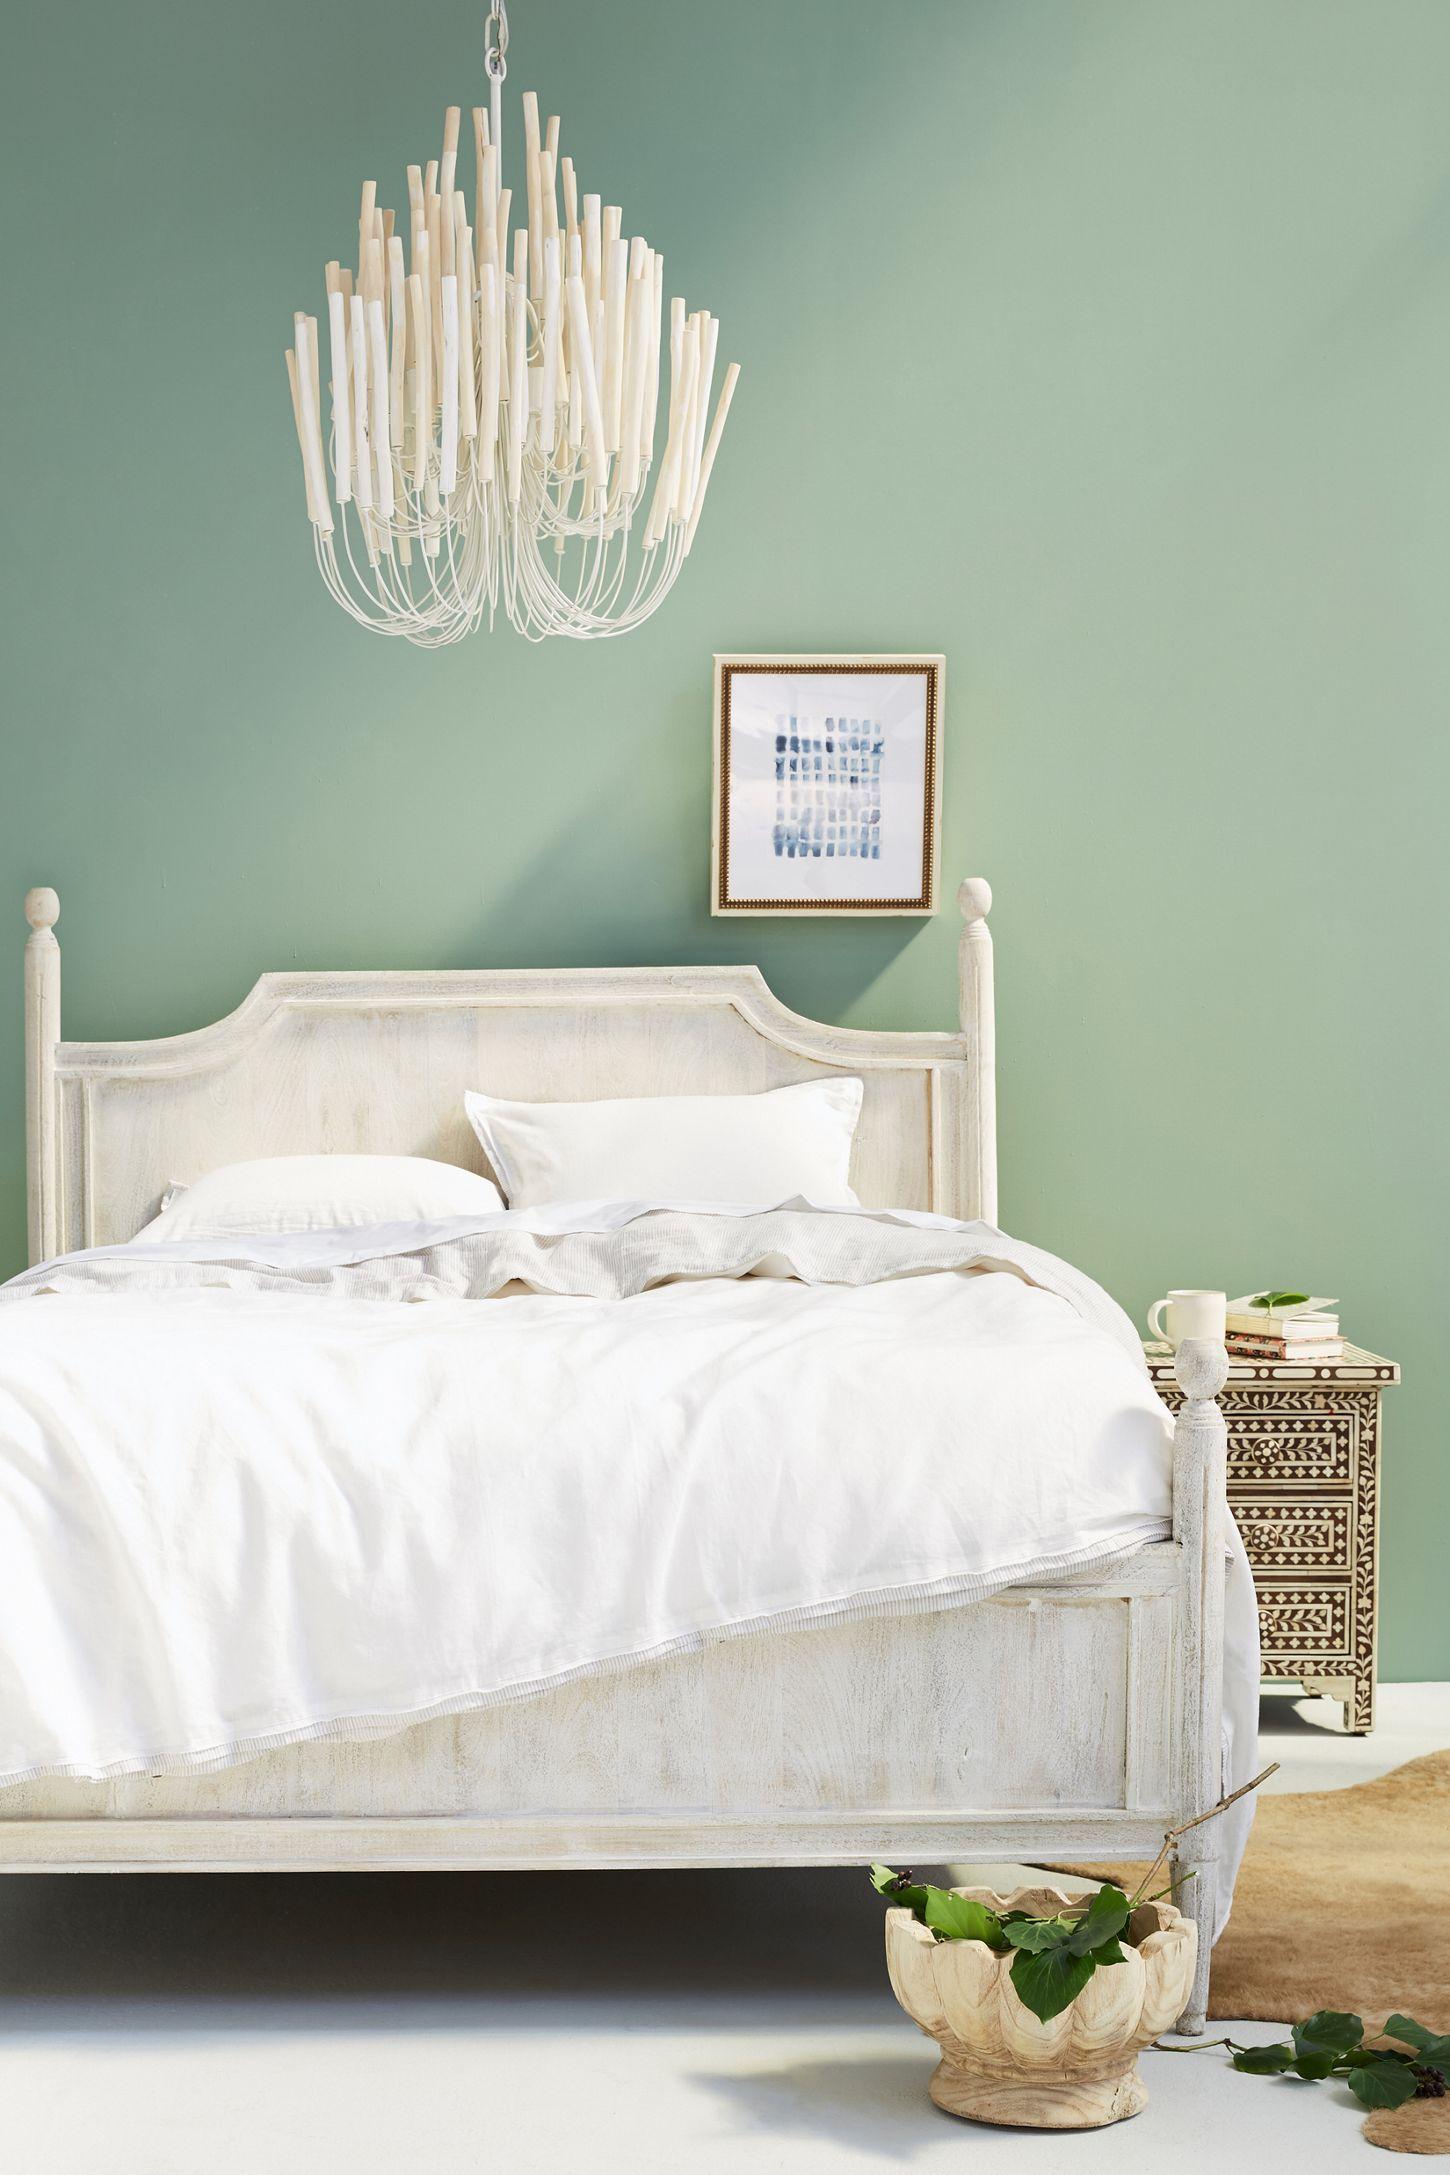 Washed Wood Bed in 2019 Vintage bedroom furniture, White